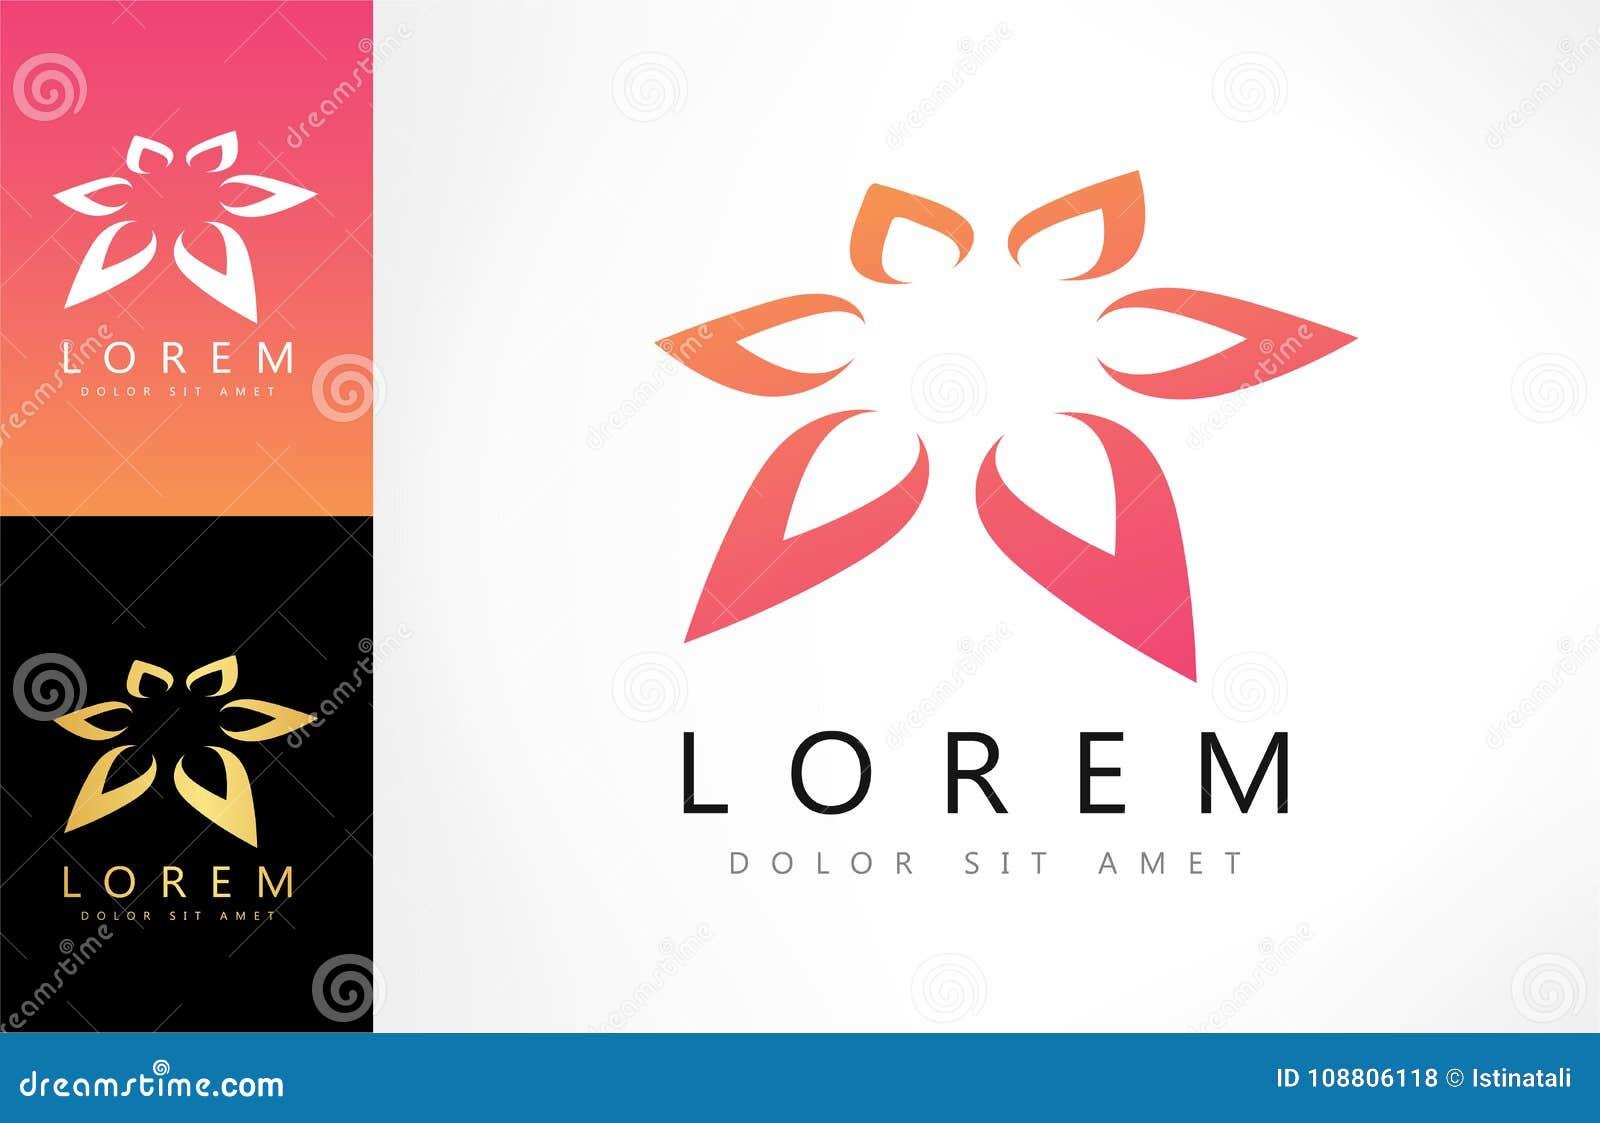 Lotus flower logo stock vector illustration of beauty 108806118 download lotus flower logo stock vector illustration of beauty 108806118 izmirmasajfo